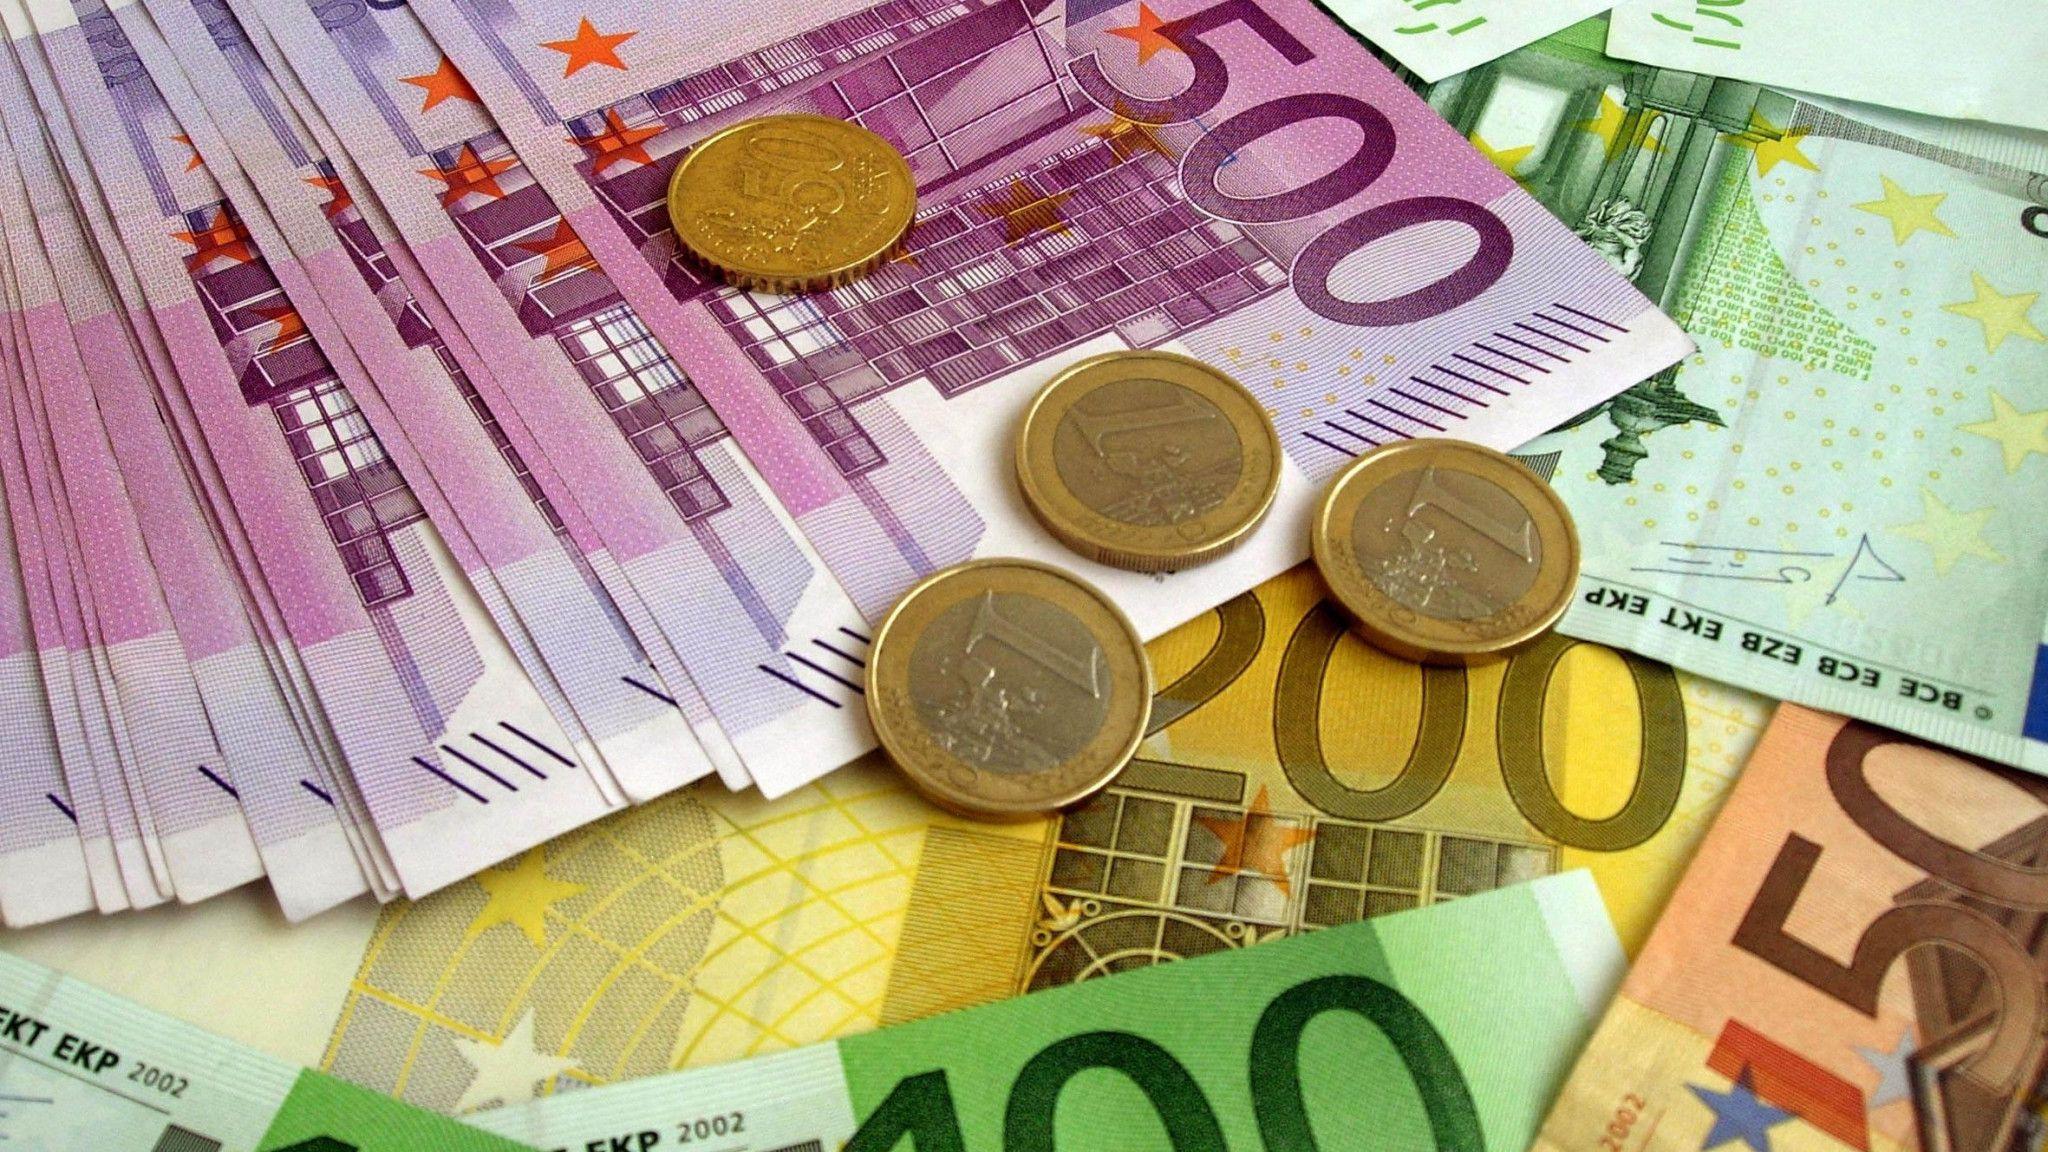 Curs valutar BNR 14 august 2020. Cât costă azi un euro